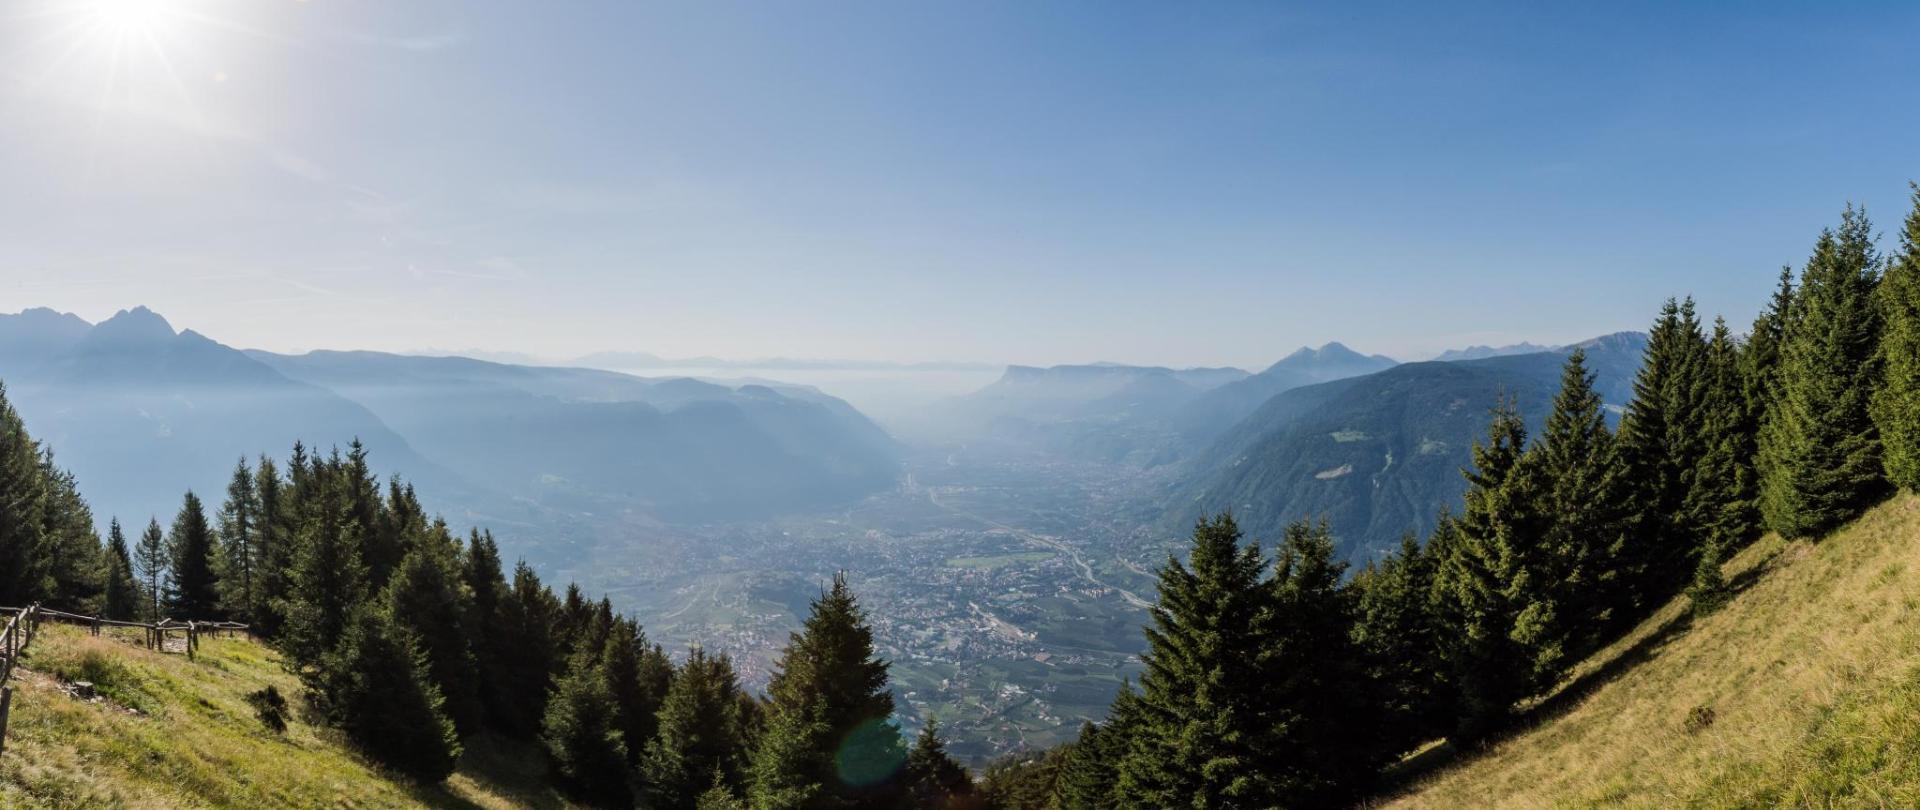 -®wisthaler.com_17_08_TV_Dorf_Tirol_HAW_4100-Pano-min.jpg